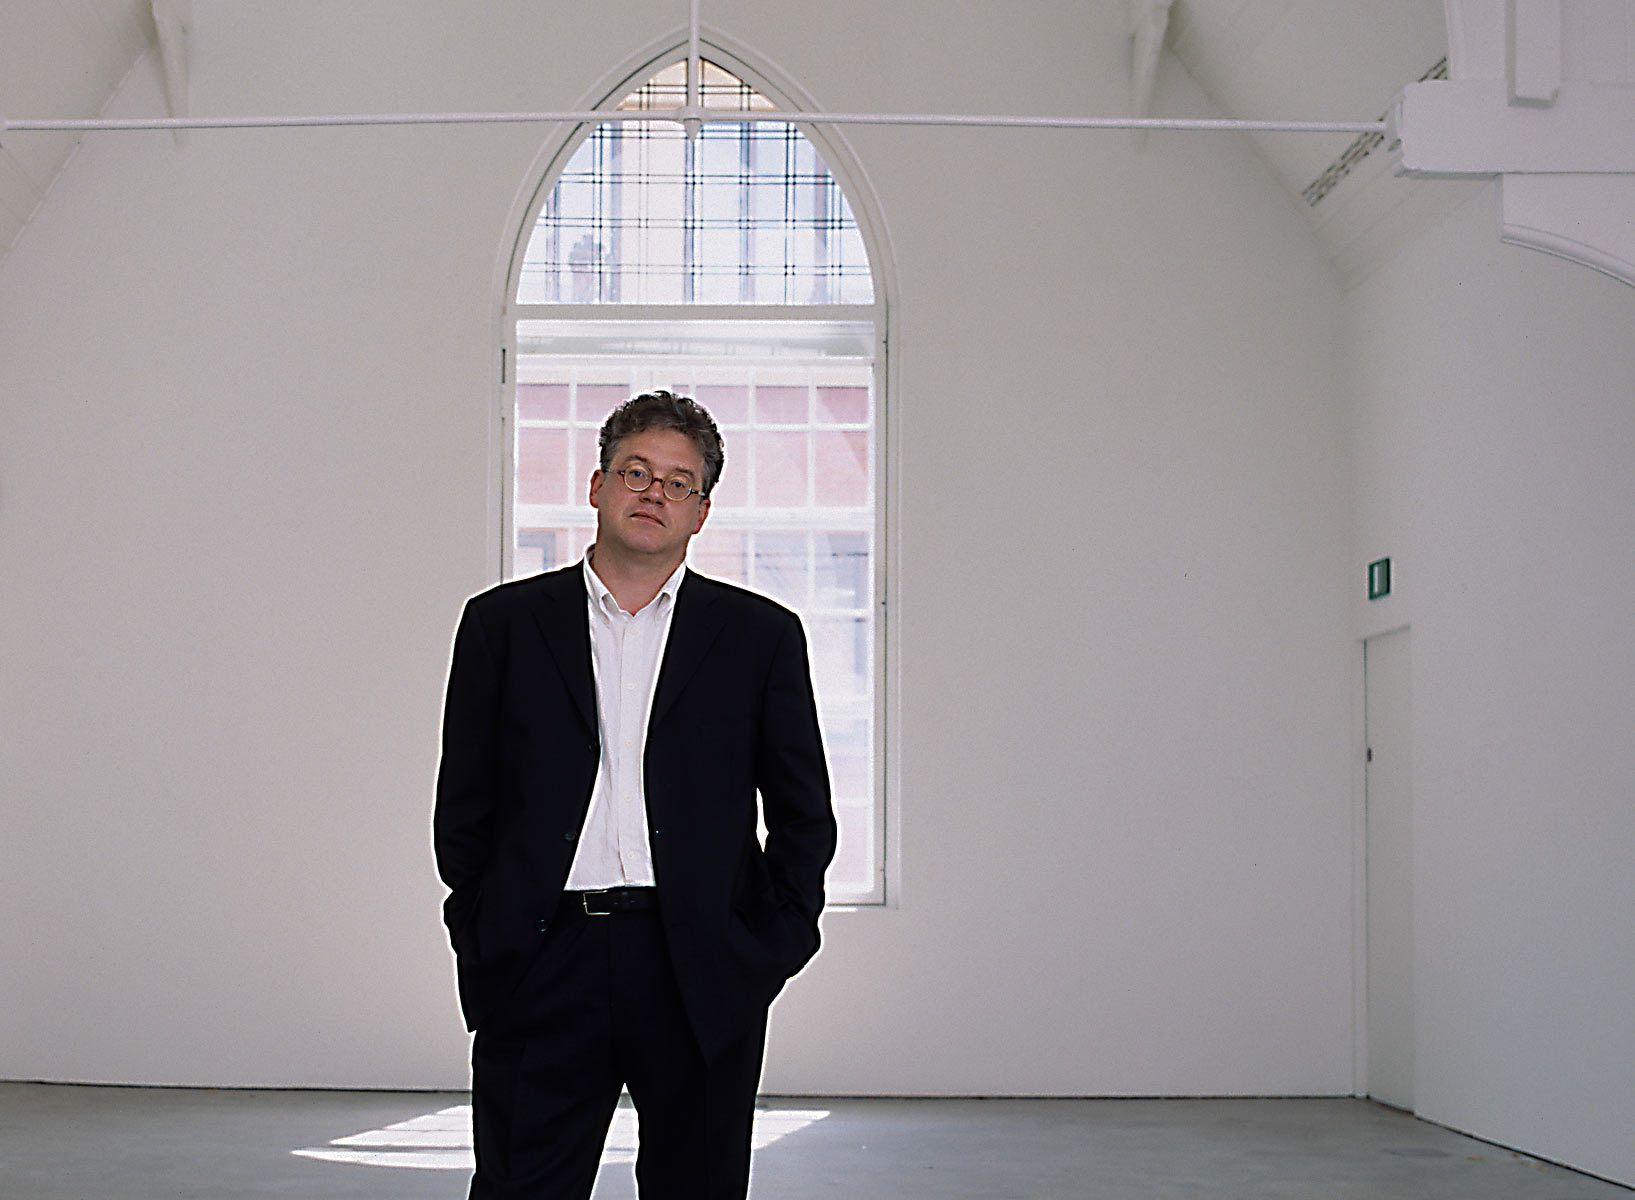 Jonathan Watkins-Ikon Gallery